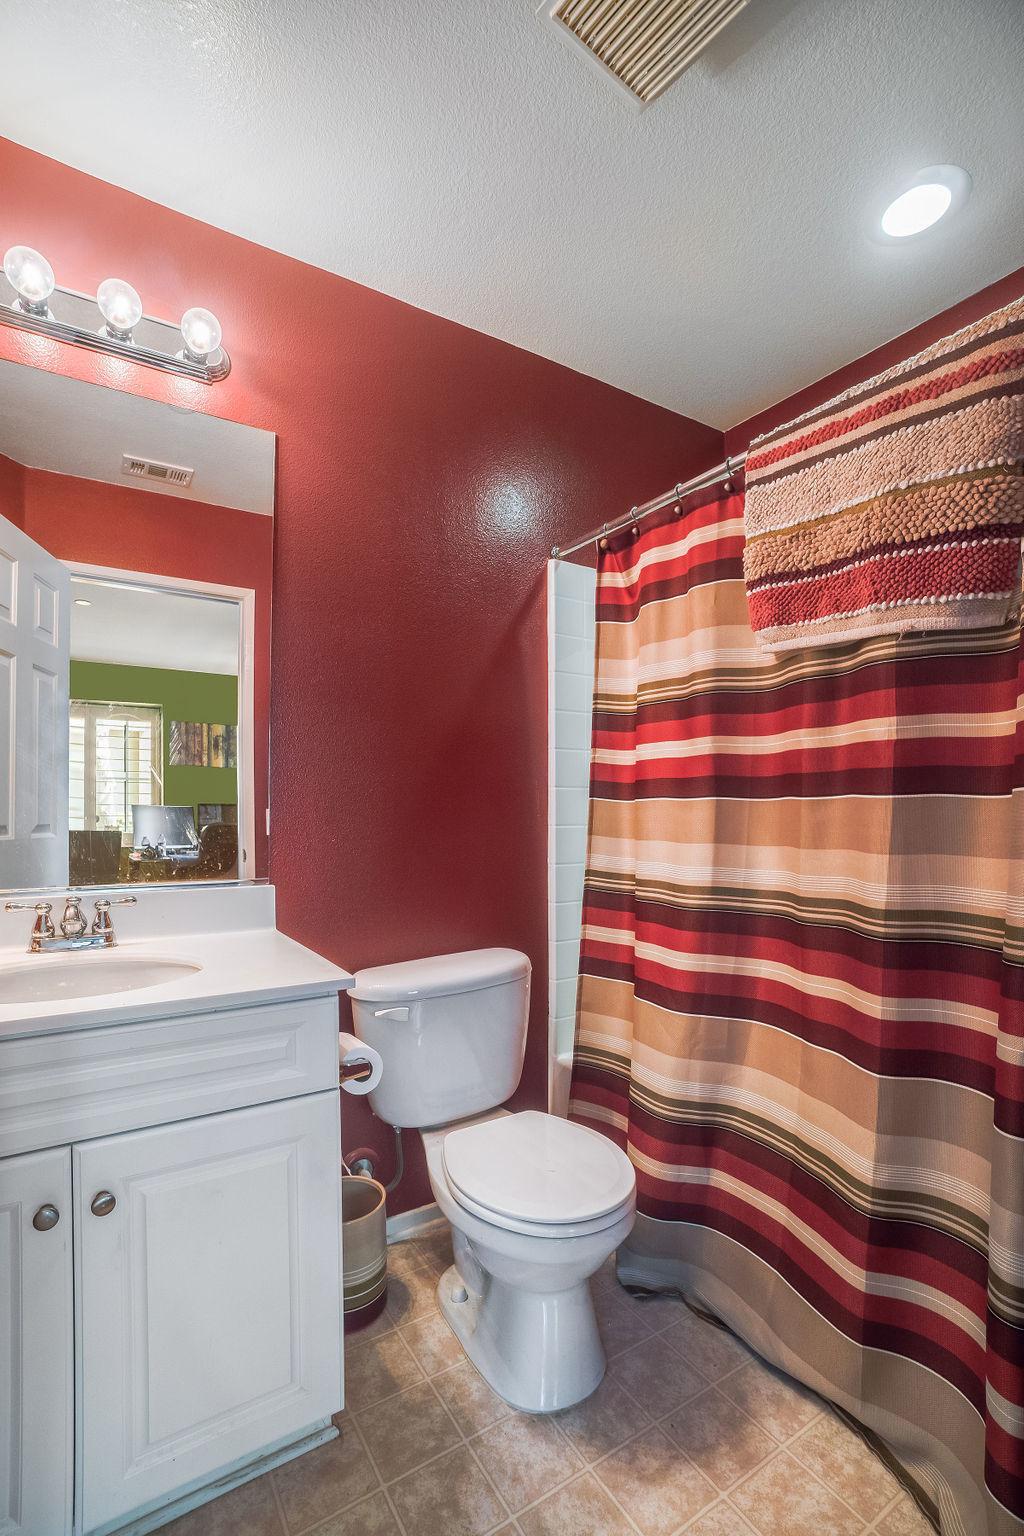 Camposa property interior photo of bathroom